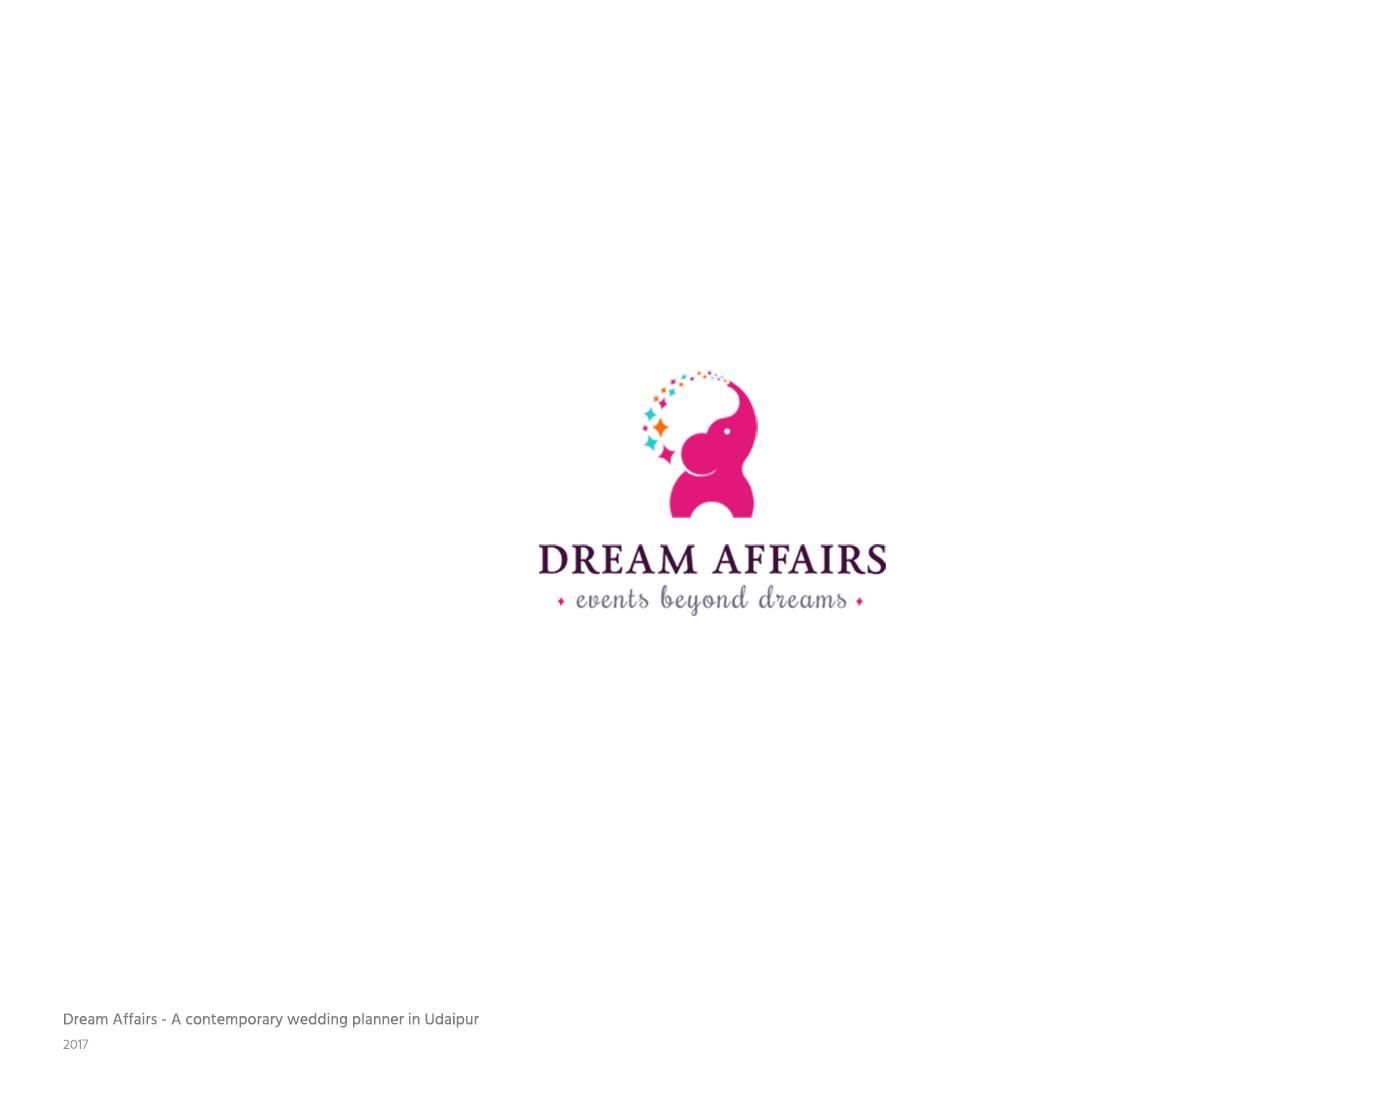 Dream Affairs Events Branding